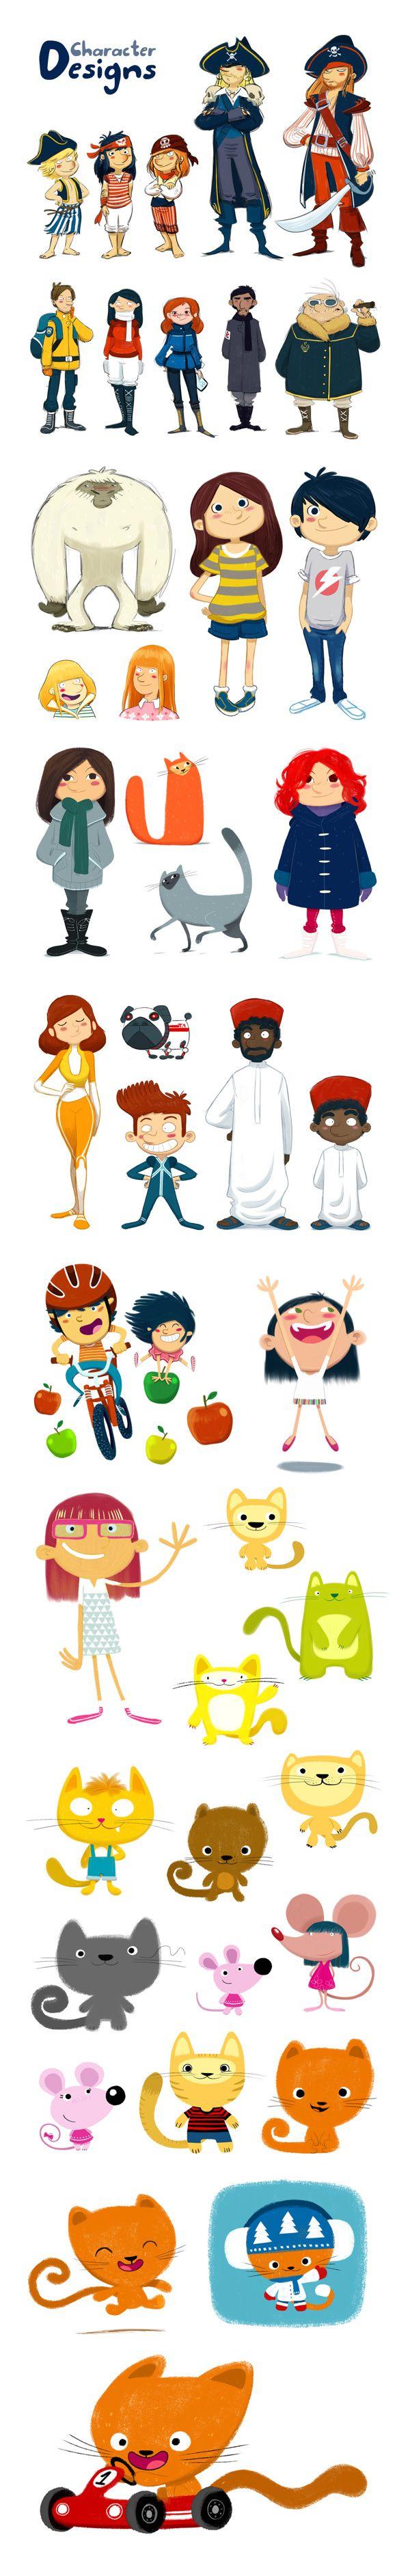 Character designs by oriol vidal, via Behance